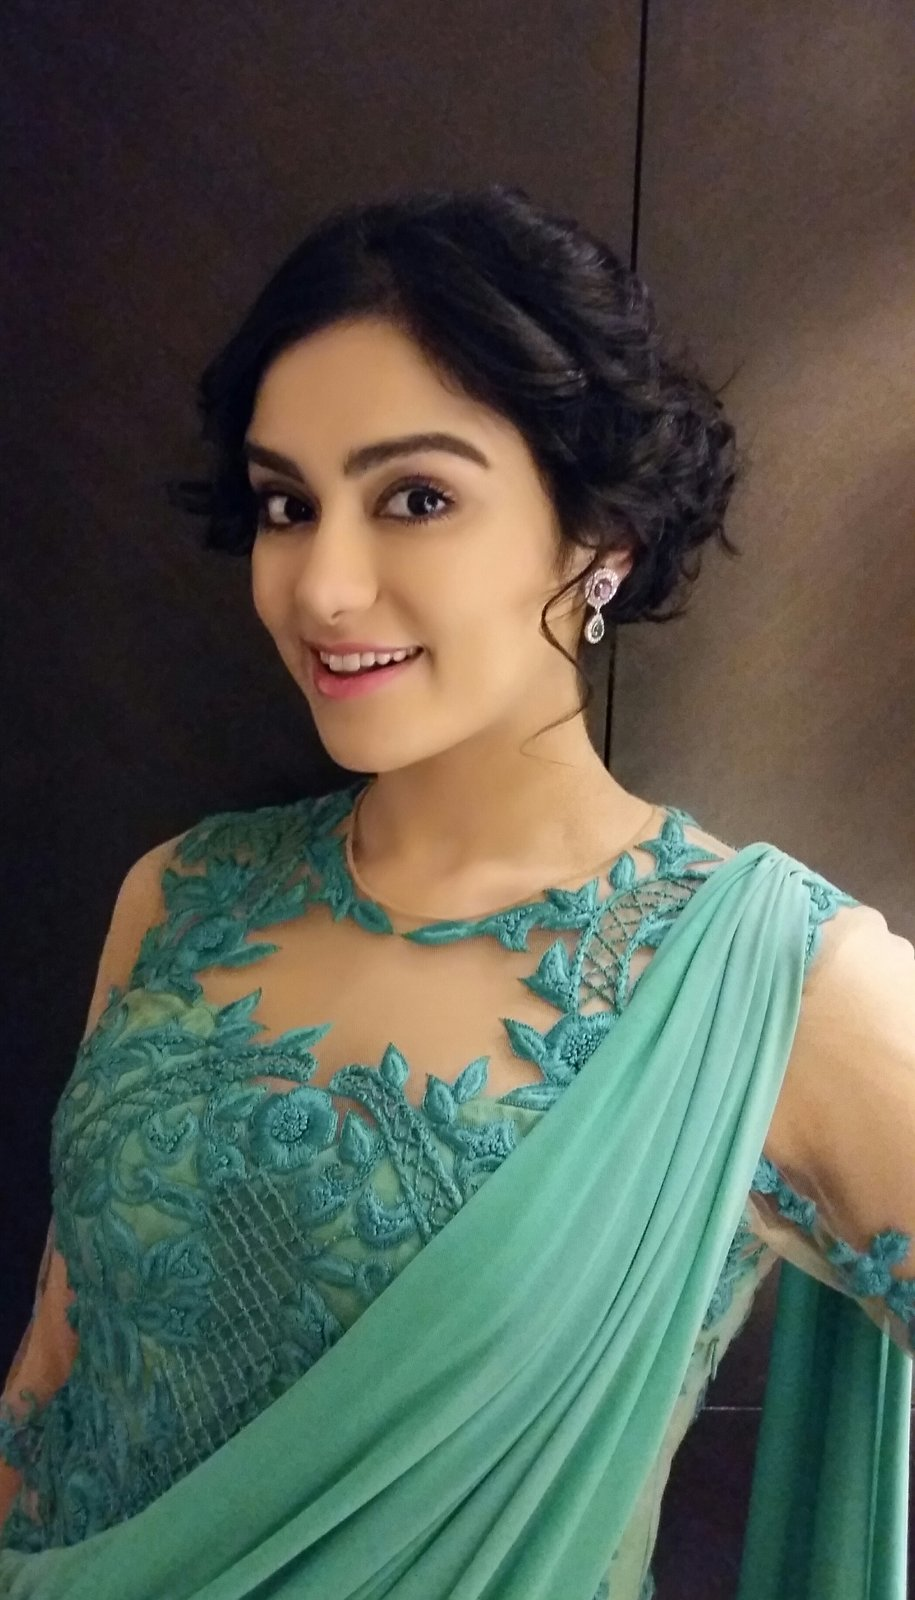 Adah Sharma Dazzling pics in green dress-HQ-Photo-2